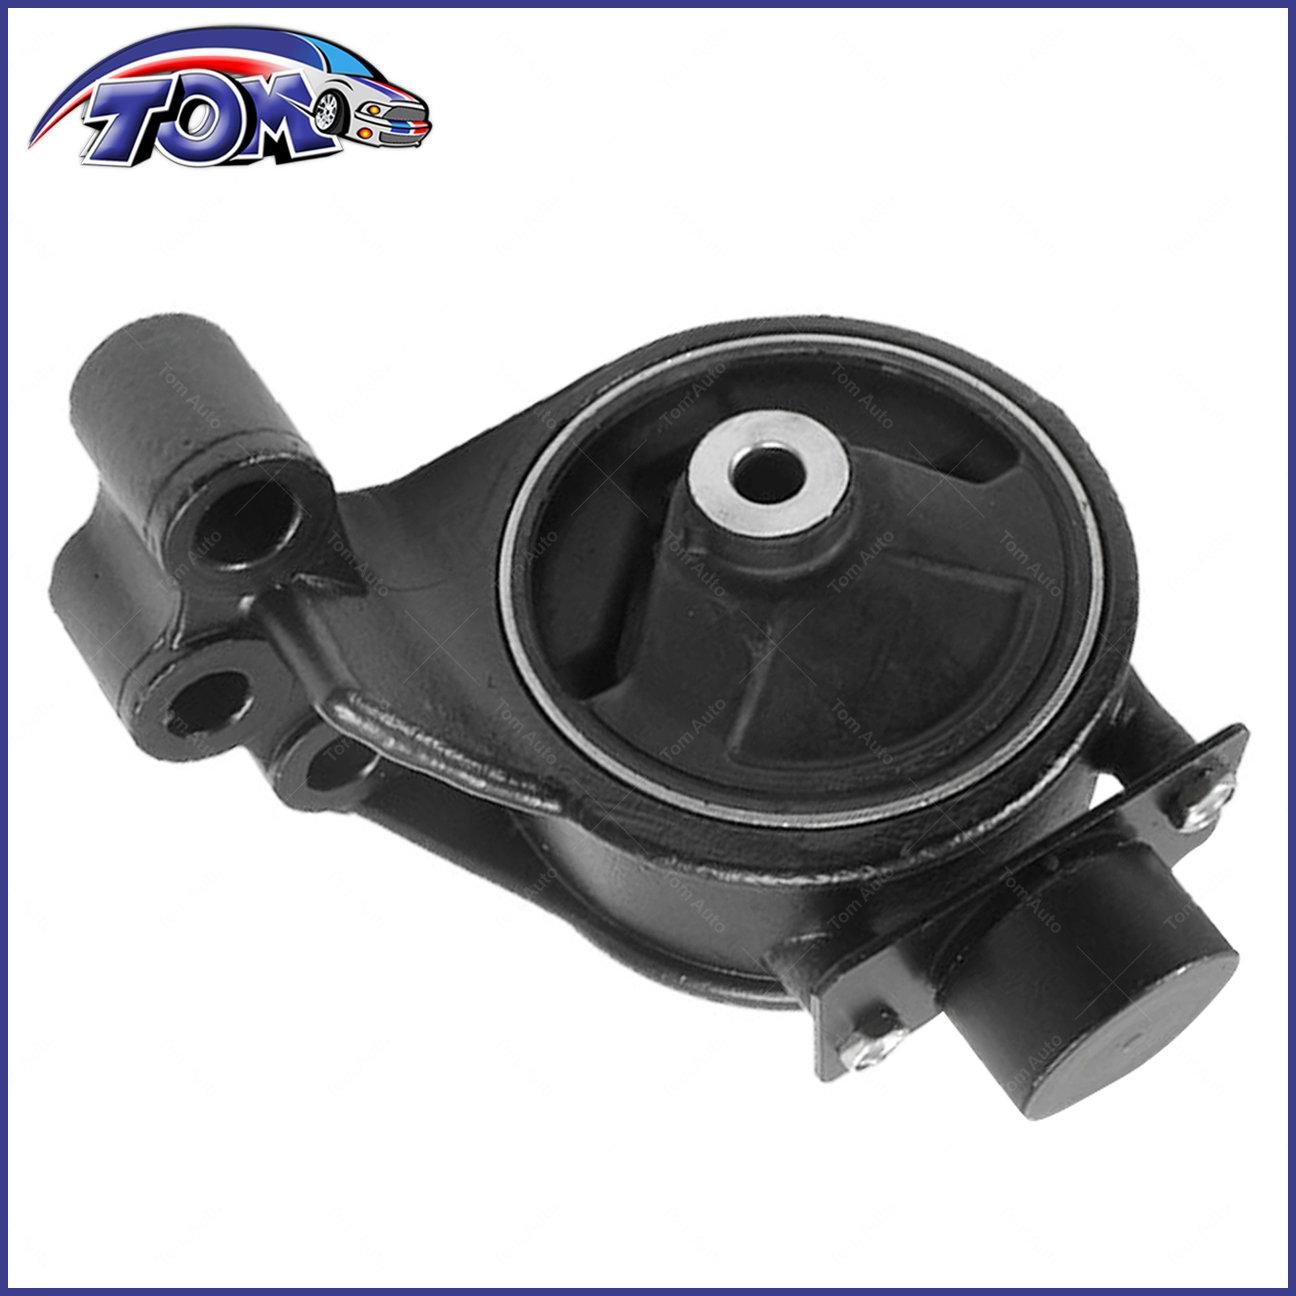 2005 Kia Sedona Motor Mount Diagram Engine Front Right For 1296x1296